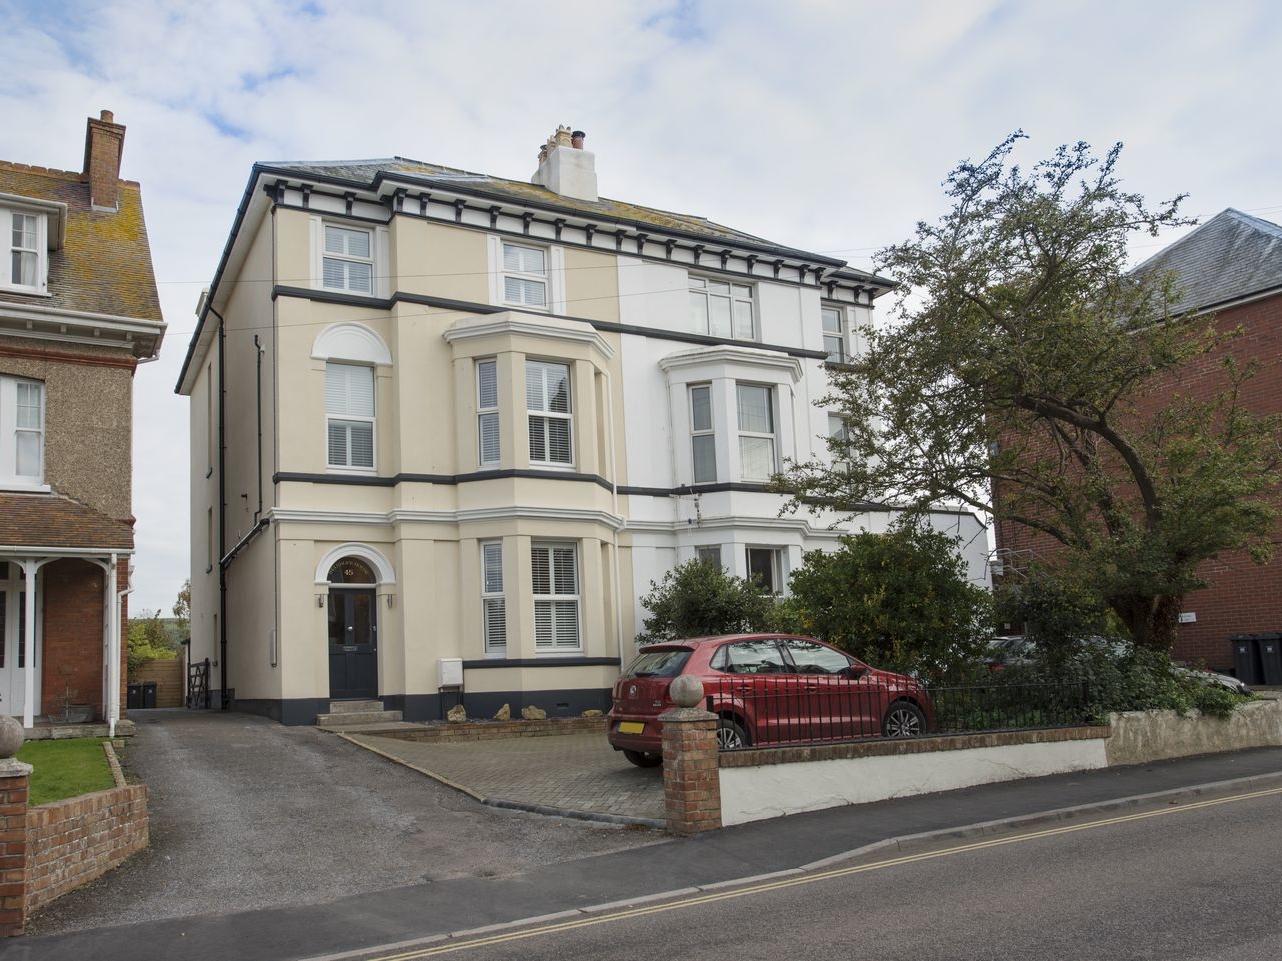 Stanhope House